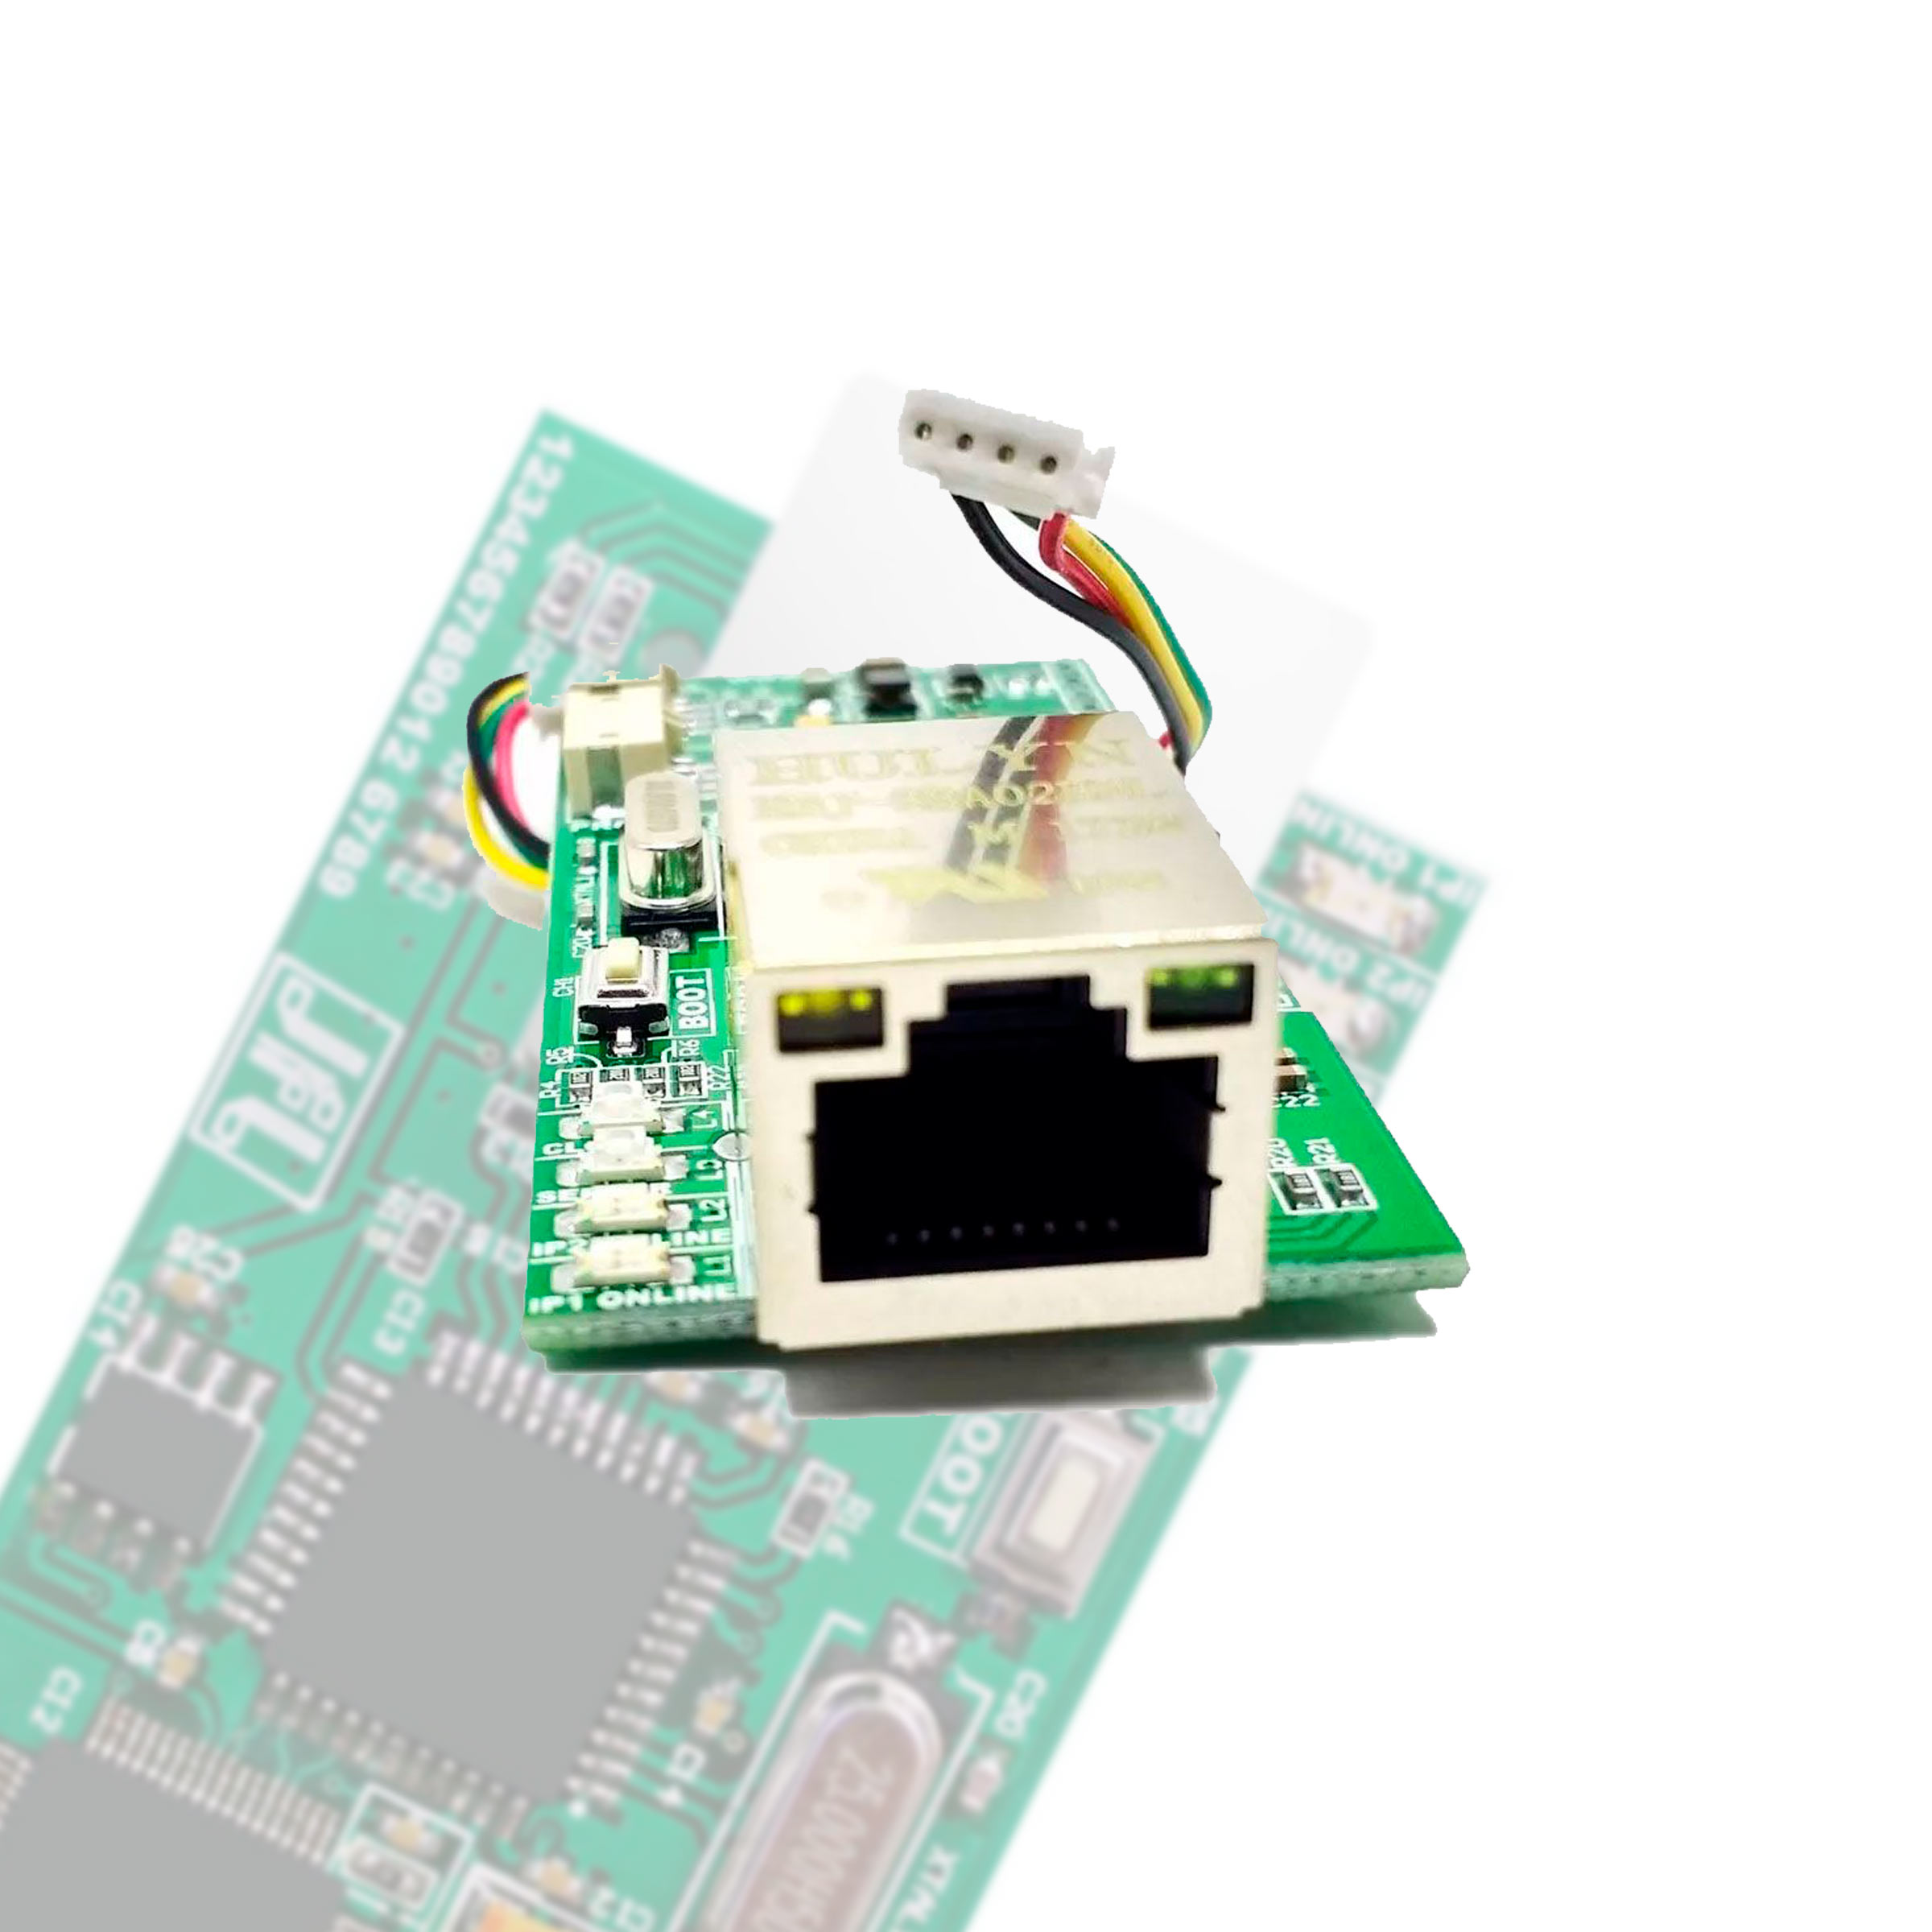 kit-cameras-de-seguranca-full-hd-vhl-1220b-02